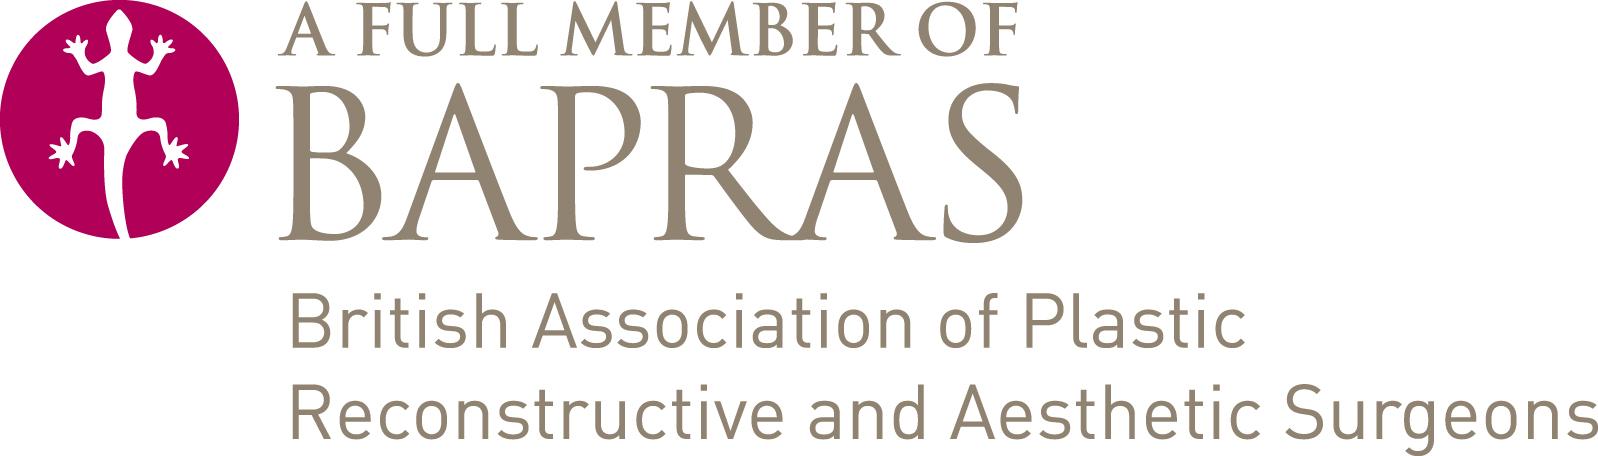 bapras british association of plastic reconstructive and aesthetic surgeons member